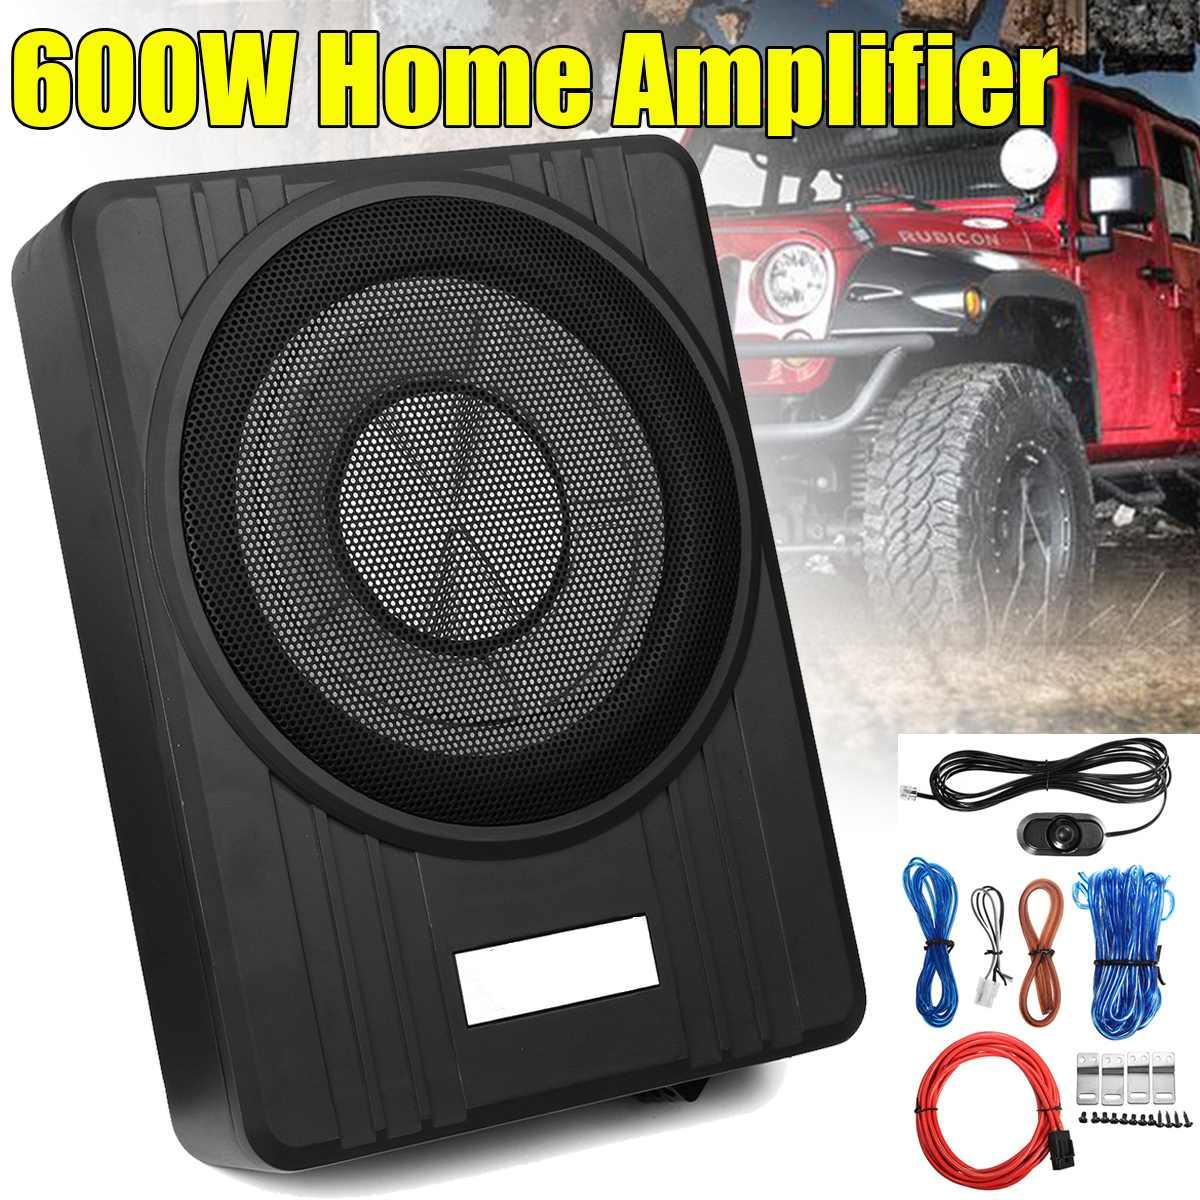 10 Inch 600W Slim Under Seat Car Speakers Car Active Subwoofer Bass Amplifier Speaker Enclosure Car Amplifier Subwoofers